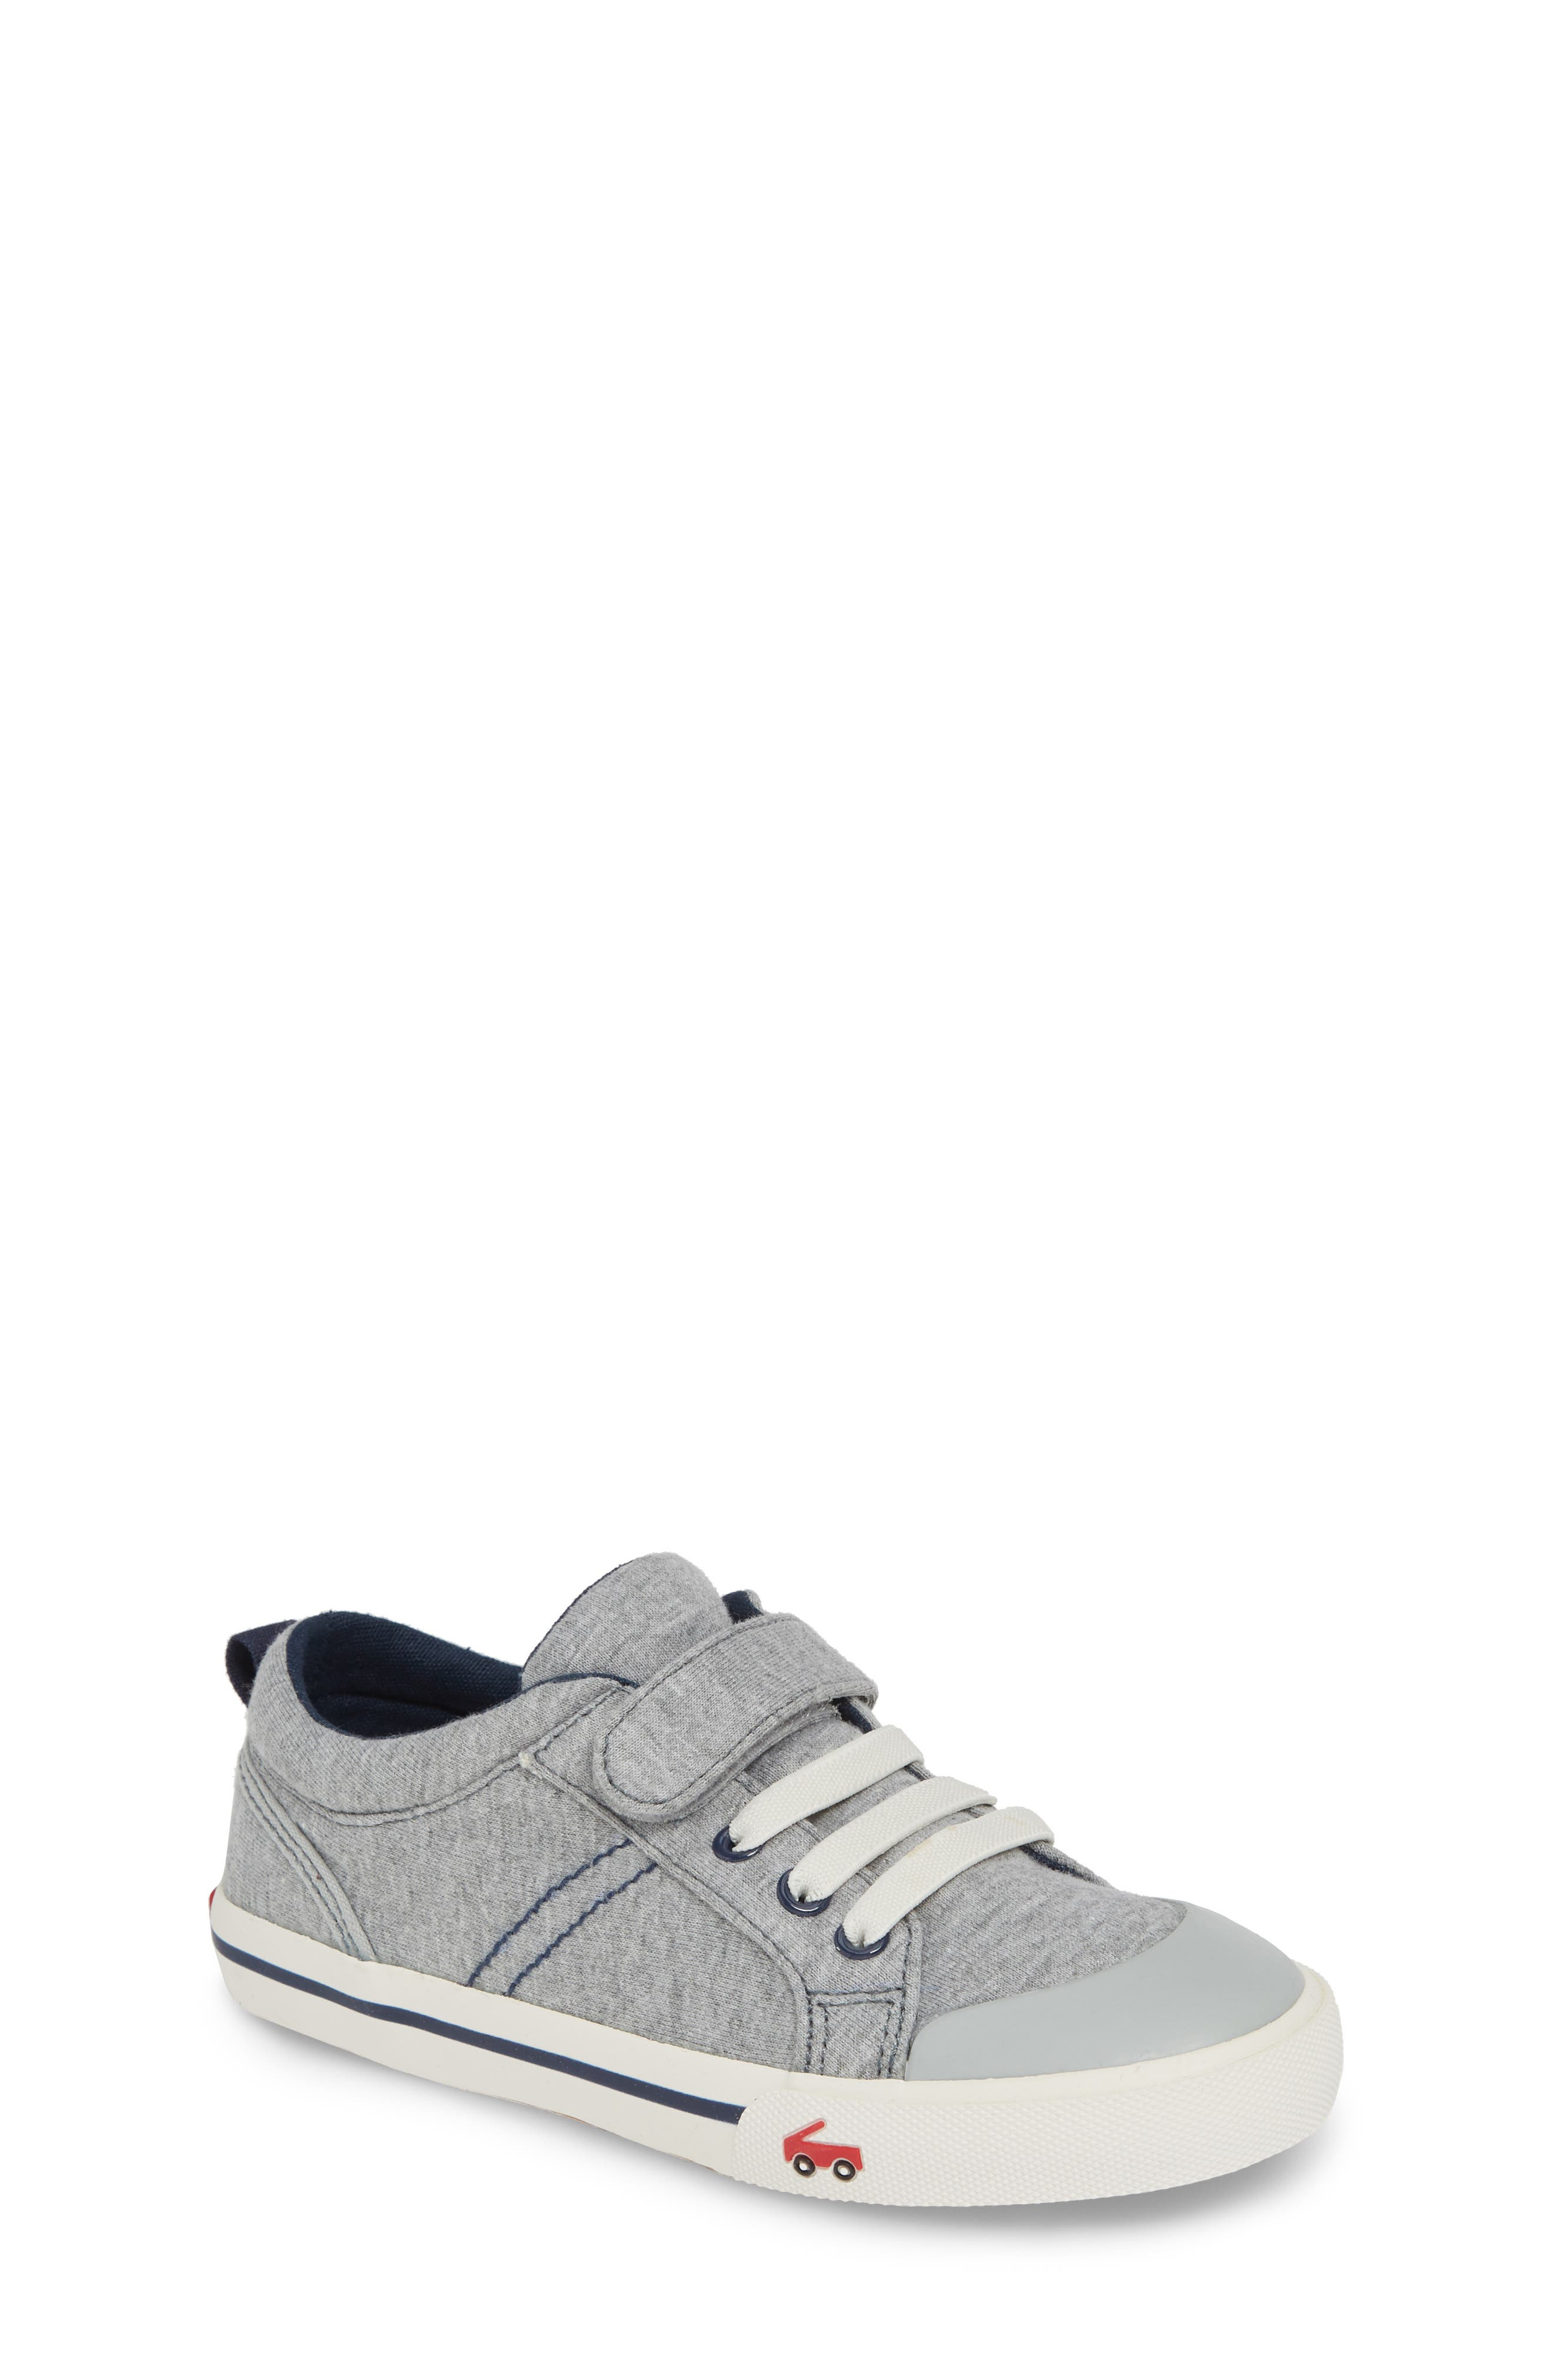 SEE KAI RUN 'Tanner' Sneaker, Main, color, GRAY/ BLUE JERSEY